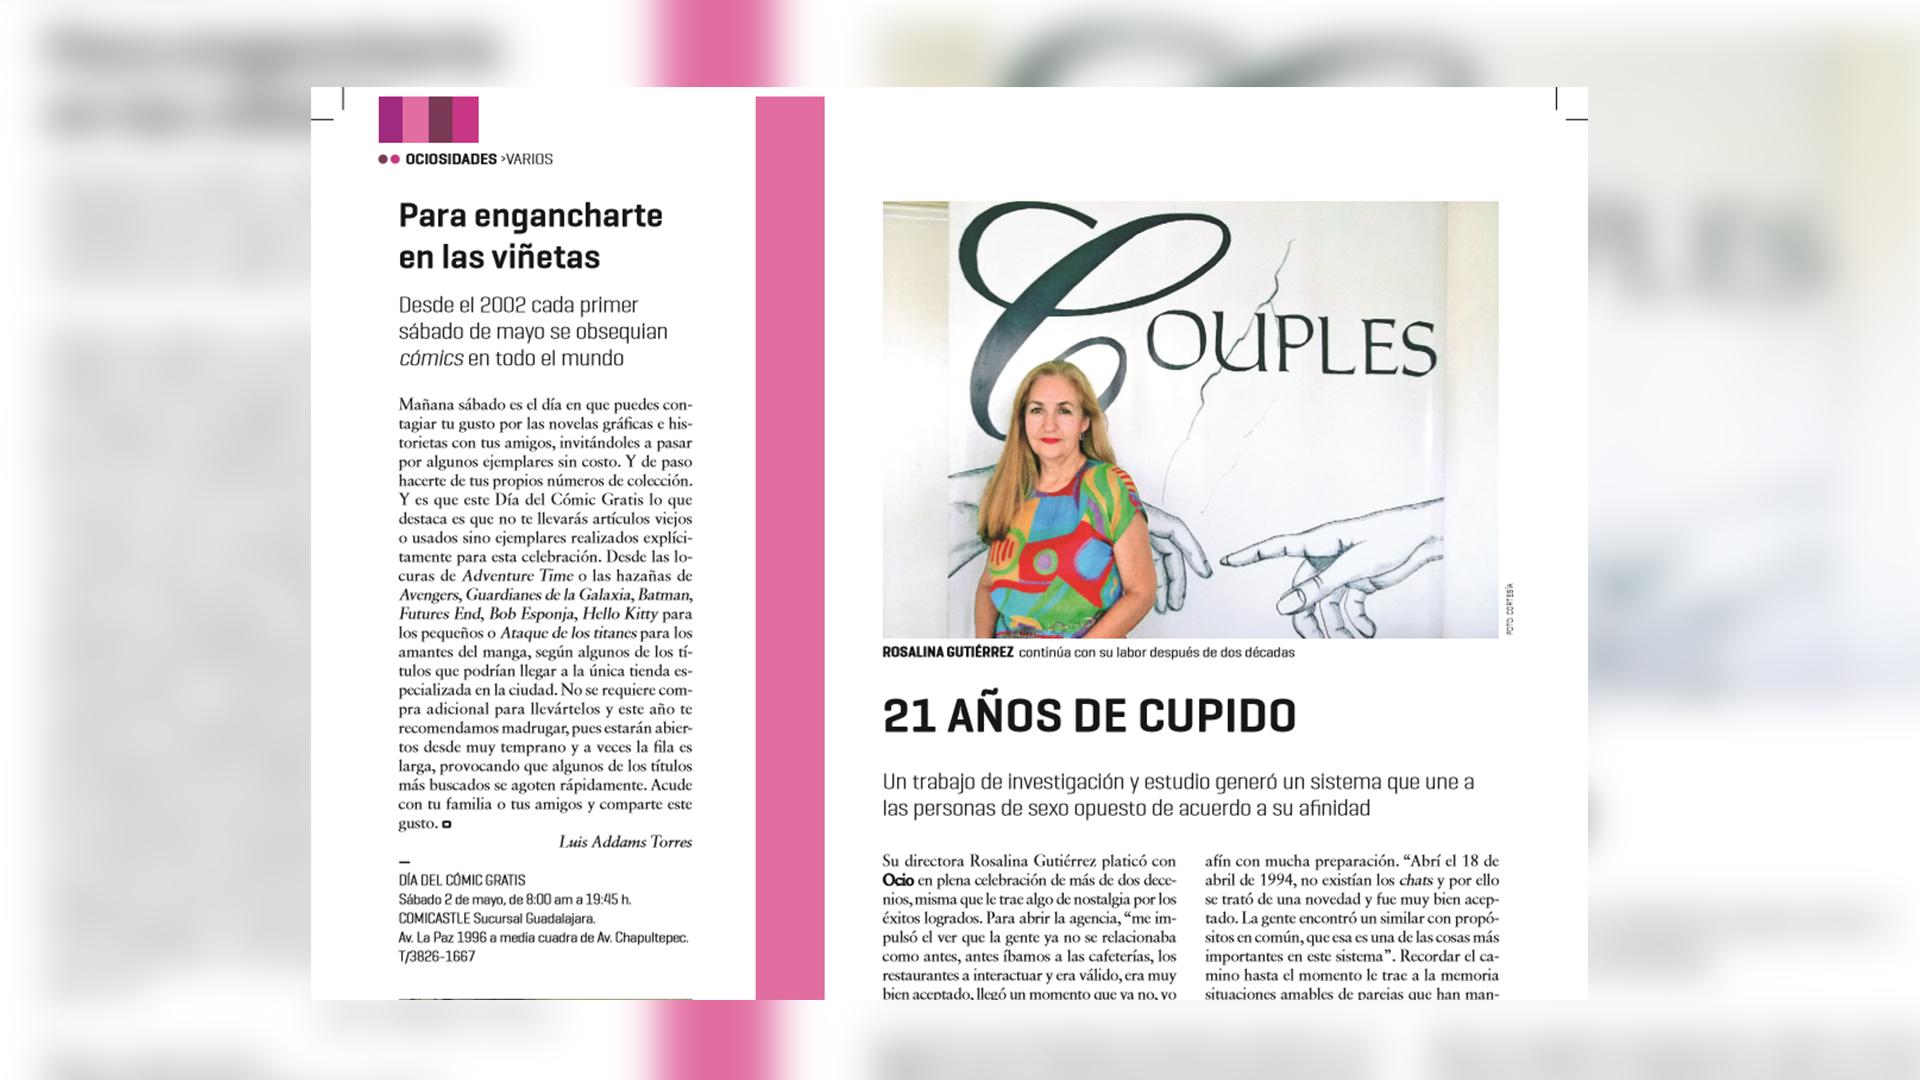 Agencia para encontrar pareja en guadalajara [PUNIQRANDLINE-(au-dating-names.txt) 64